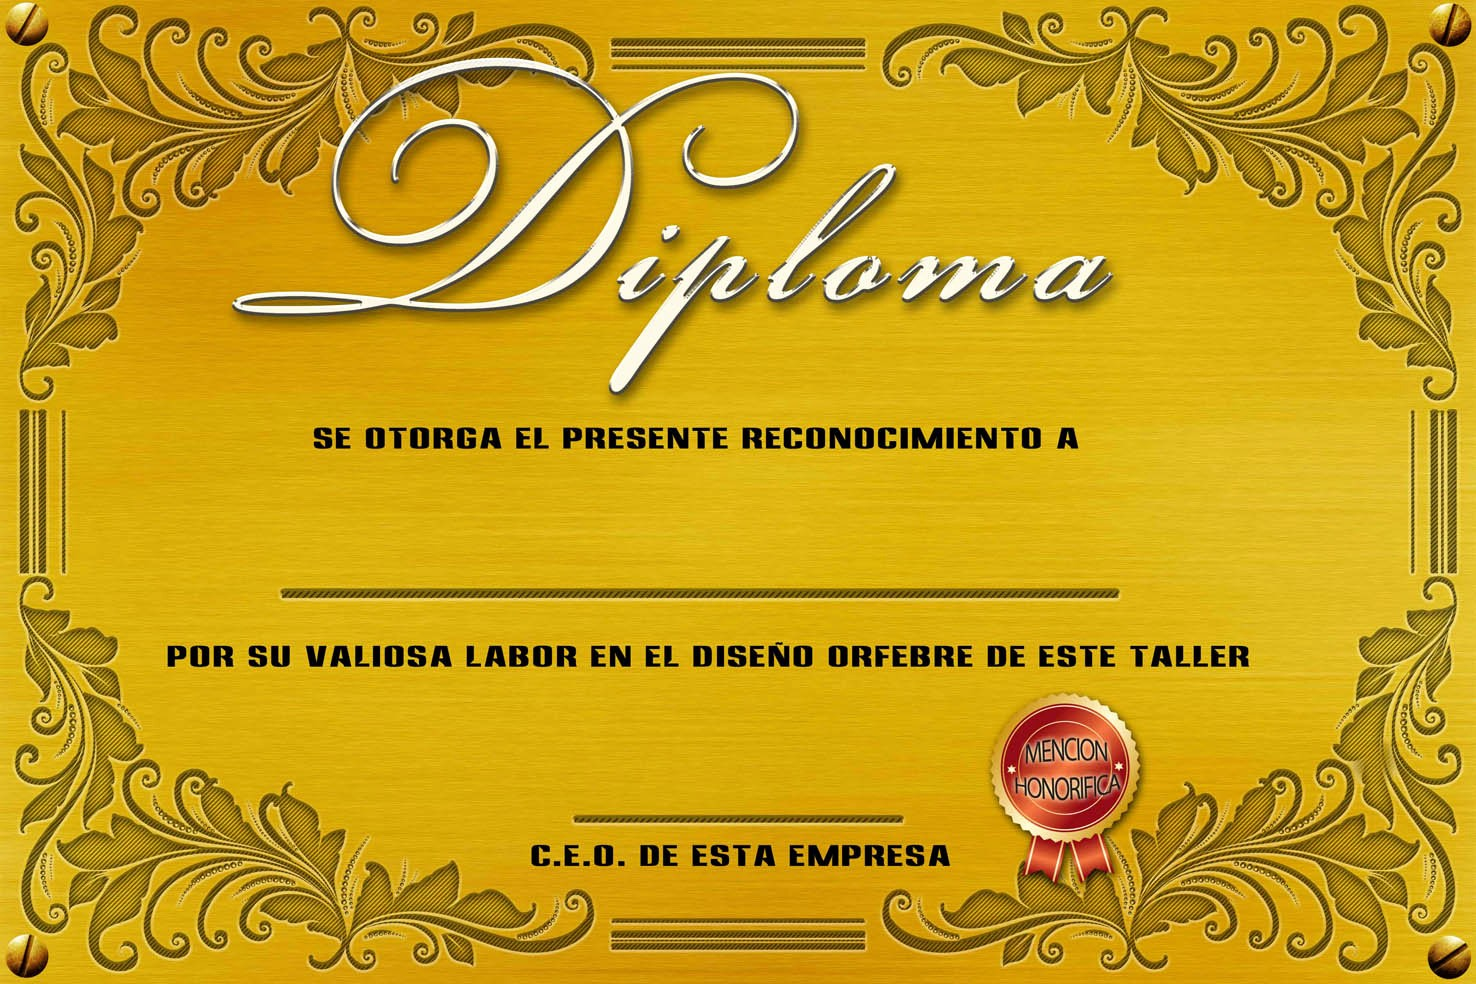 Formatos De Diplomas Para Modificar Beautiful Diplomas Para Imprimir De Futbol Imagui